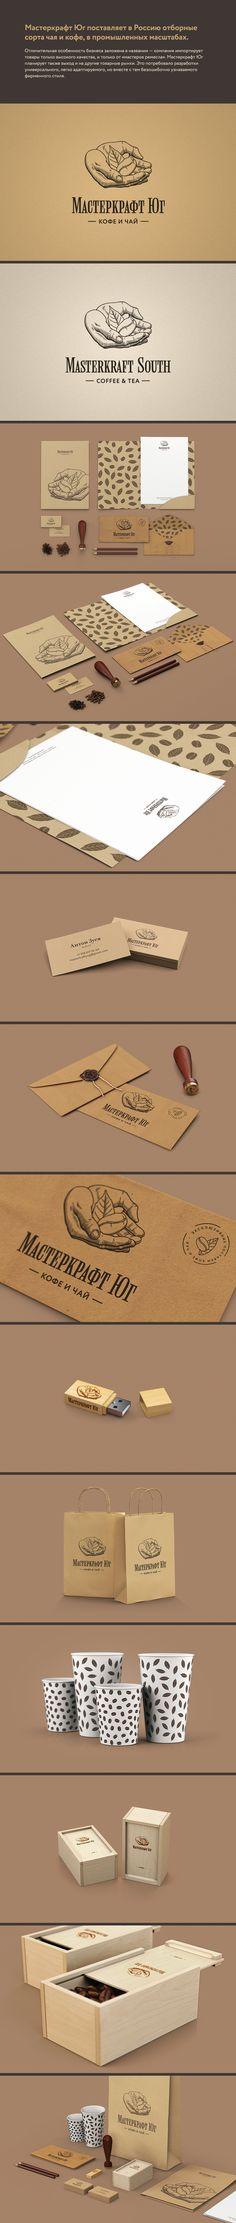 Брендинг для «Мастеркрафт Юг»  Фирменный стиль © Helix Advance MasterKraft #packaging #branding #marketing PD